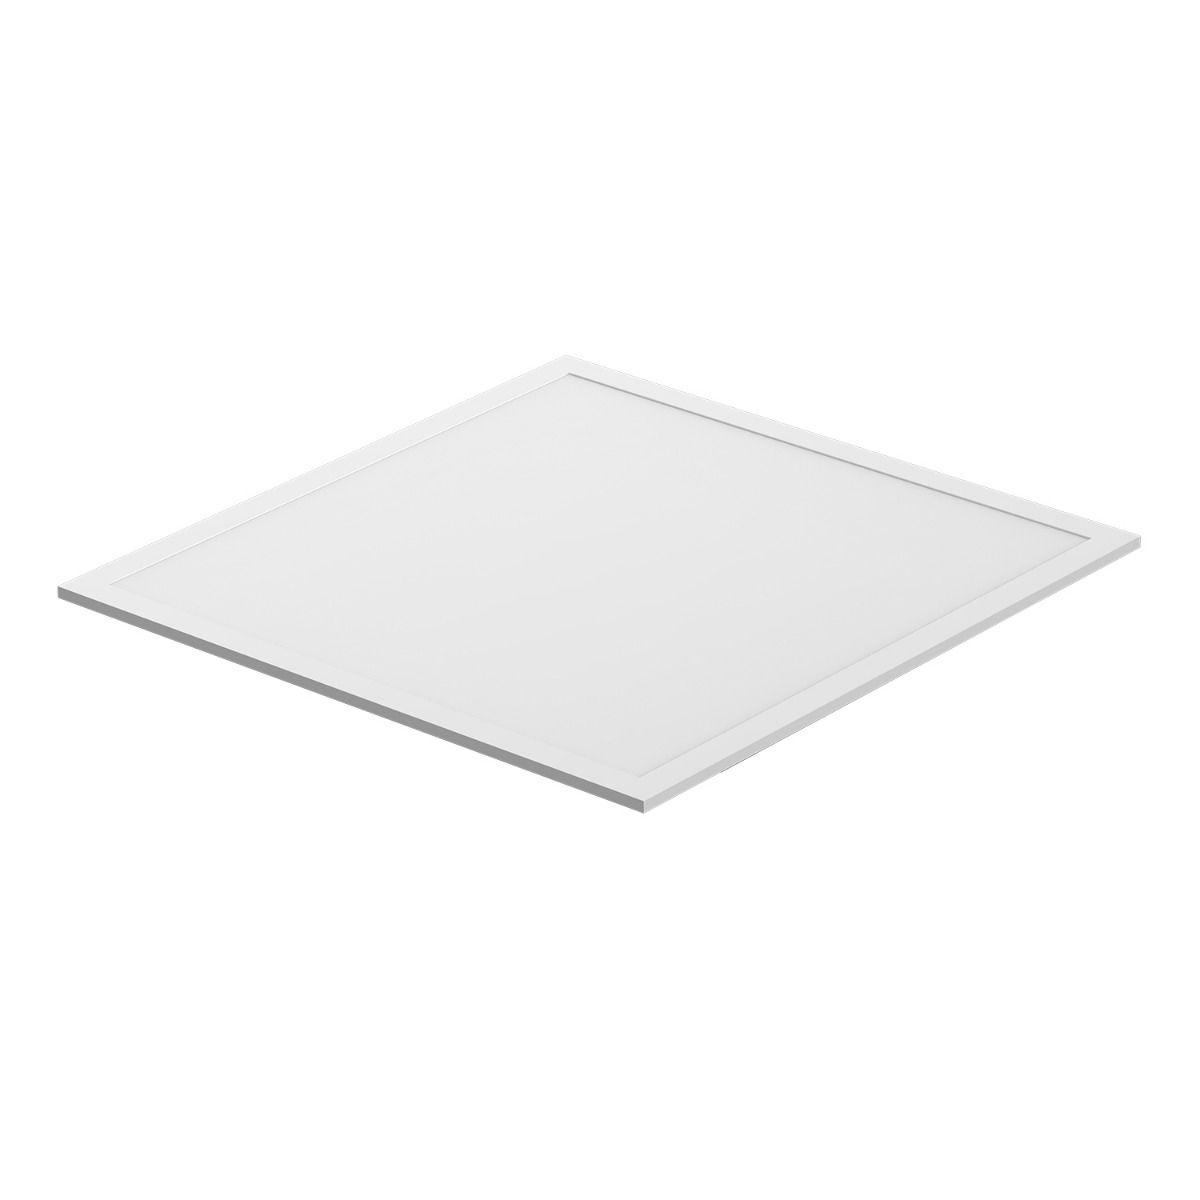 Noxion Panel LED Delta Pro V2.0 30W 60x60cm 3000K 3960lm UGR <19 | Luz Cálida - Reemplazo 4x18W